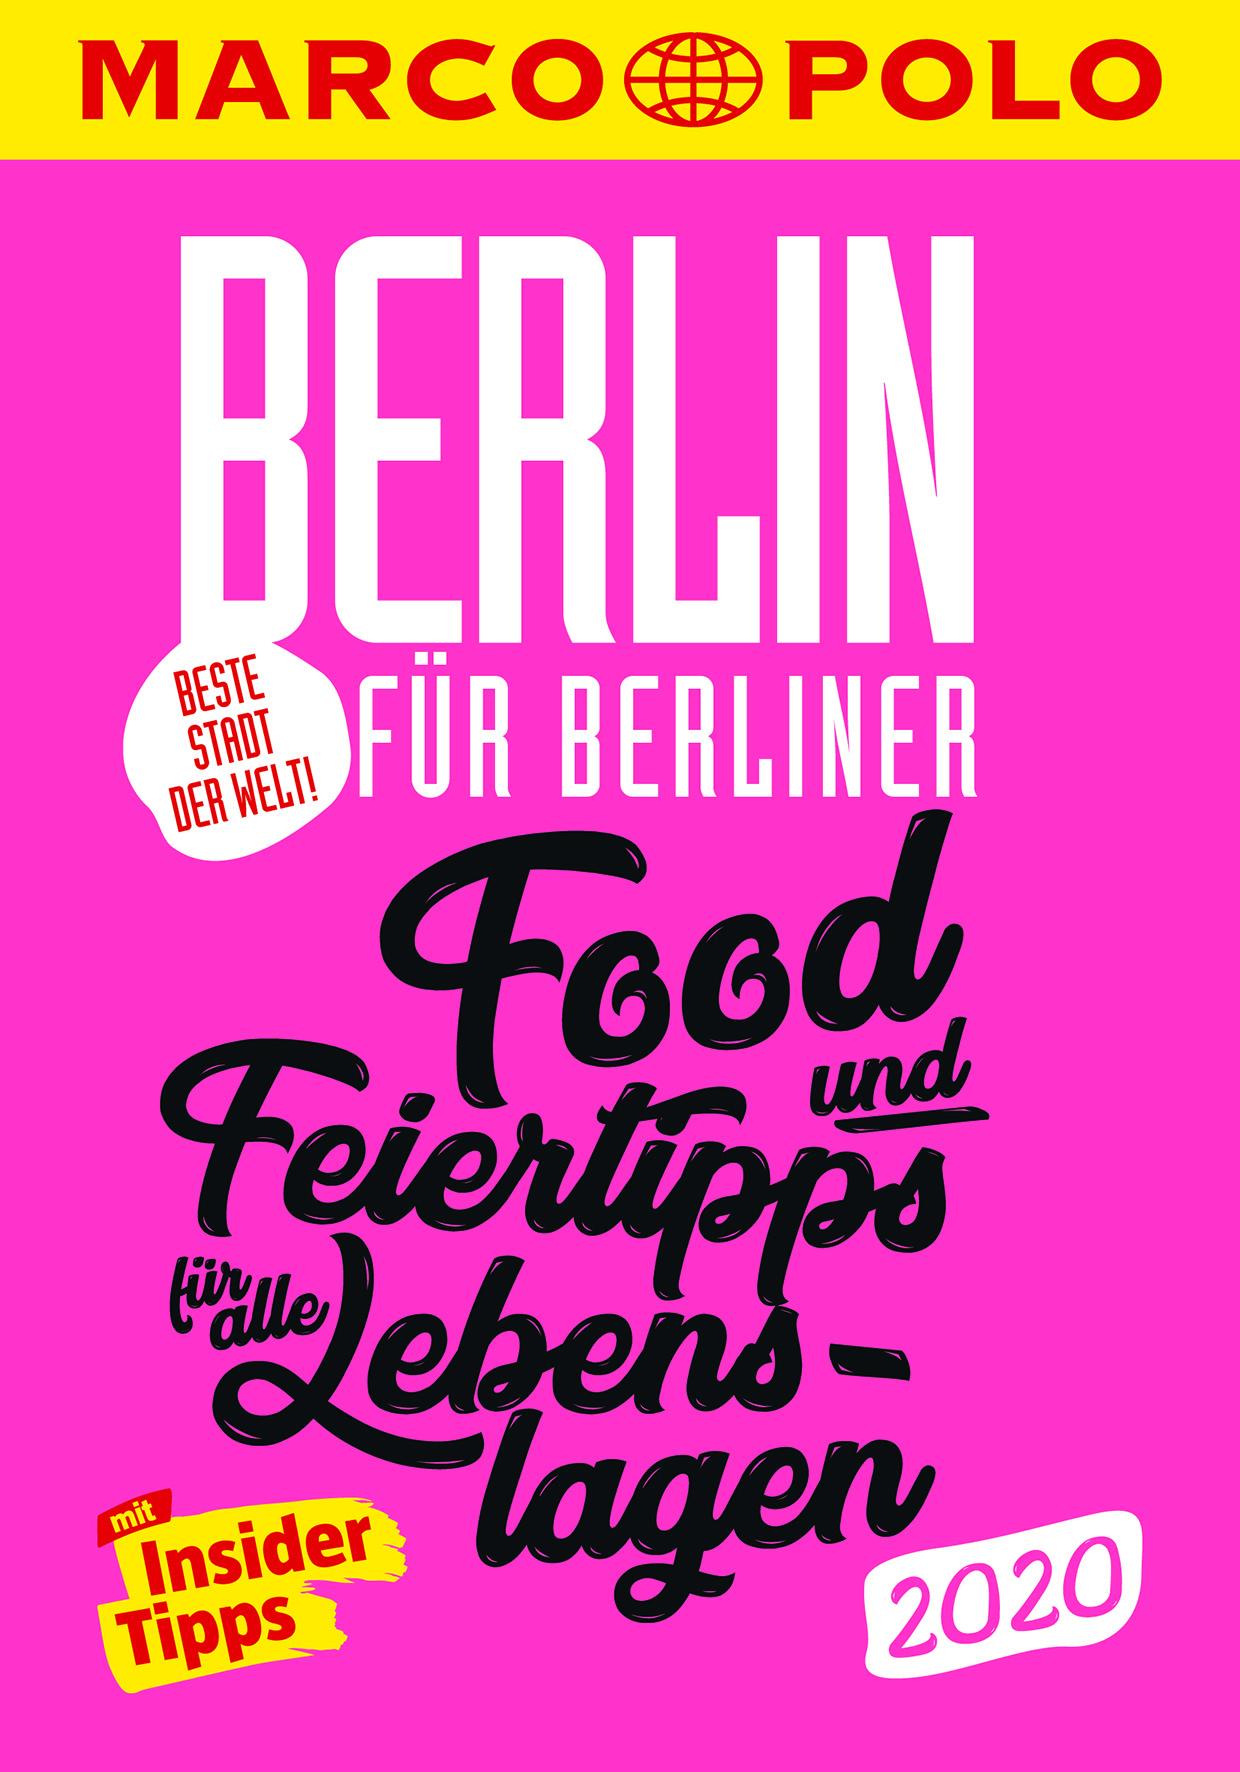 Marco Polo - Beste Stadt der Welt Berlin 2020 (Cover)